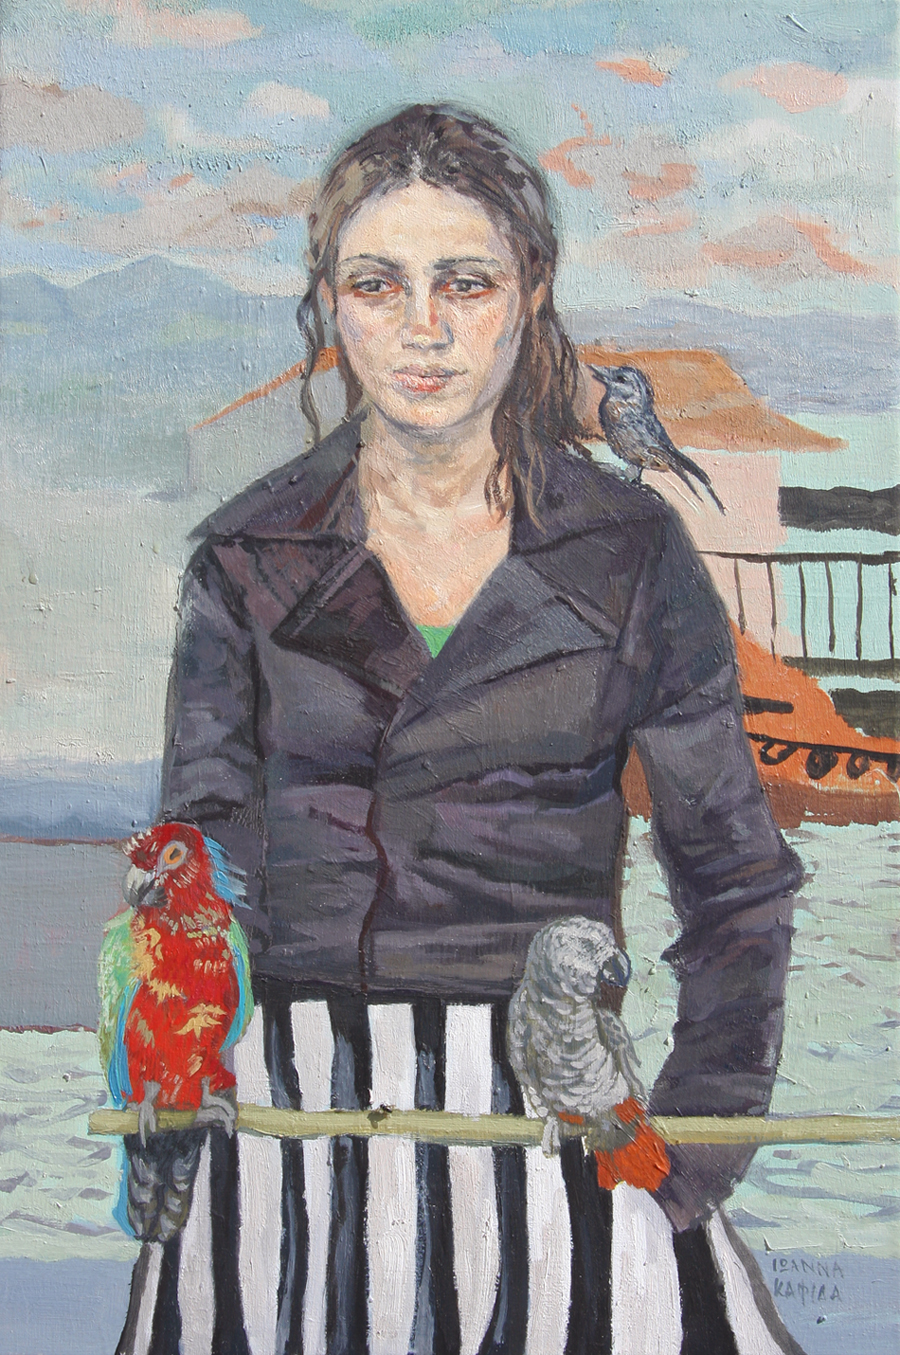 Selfportrait, 2010